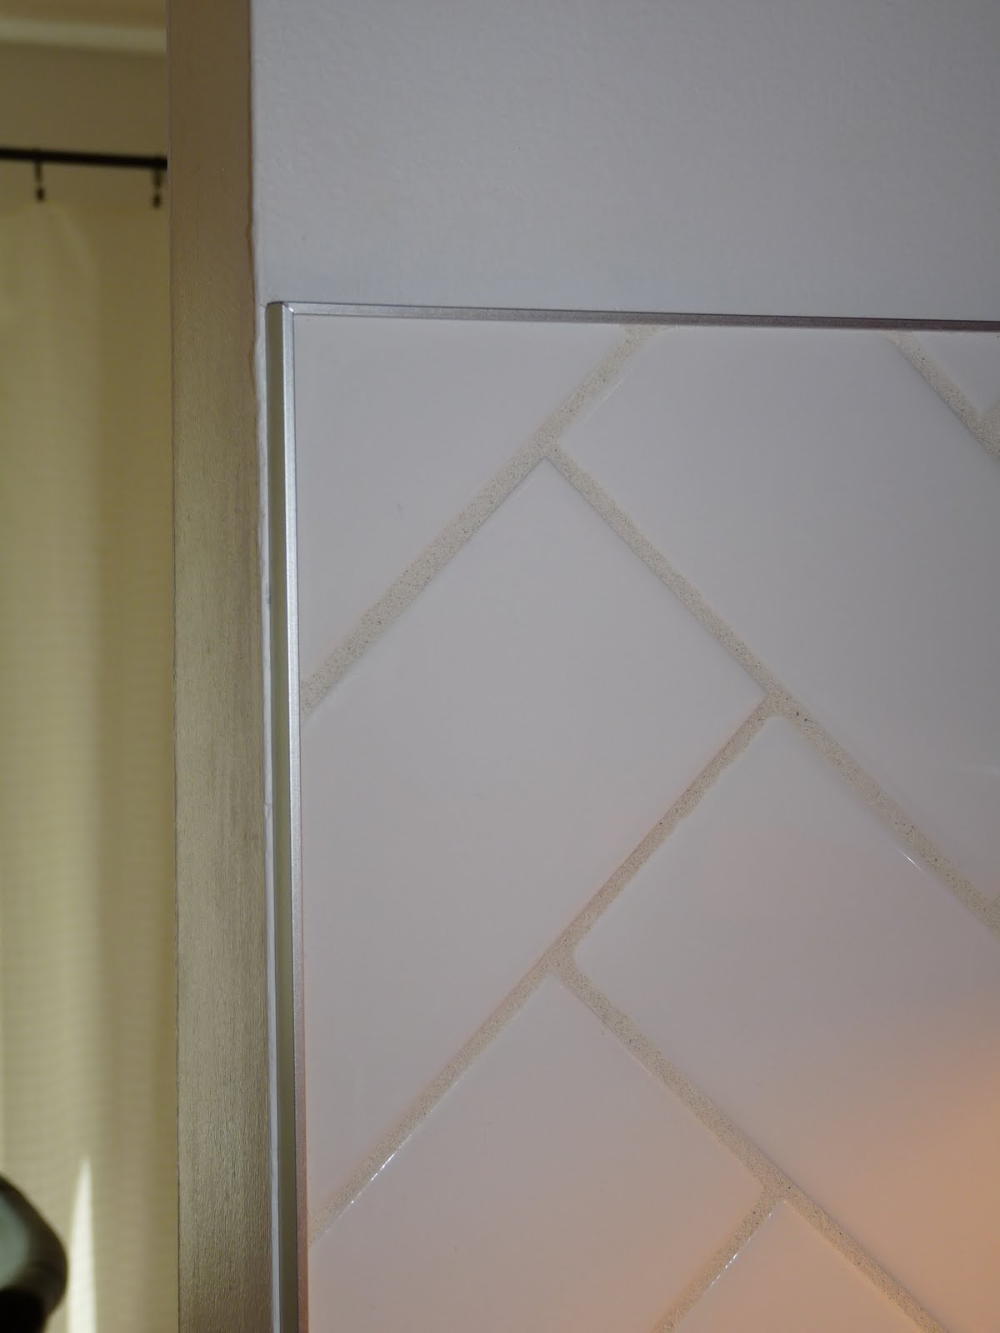 How To Finish Tile With Metal Edging Tile Trim Tile Edge Metal Edging